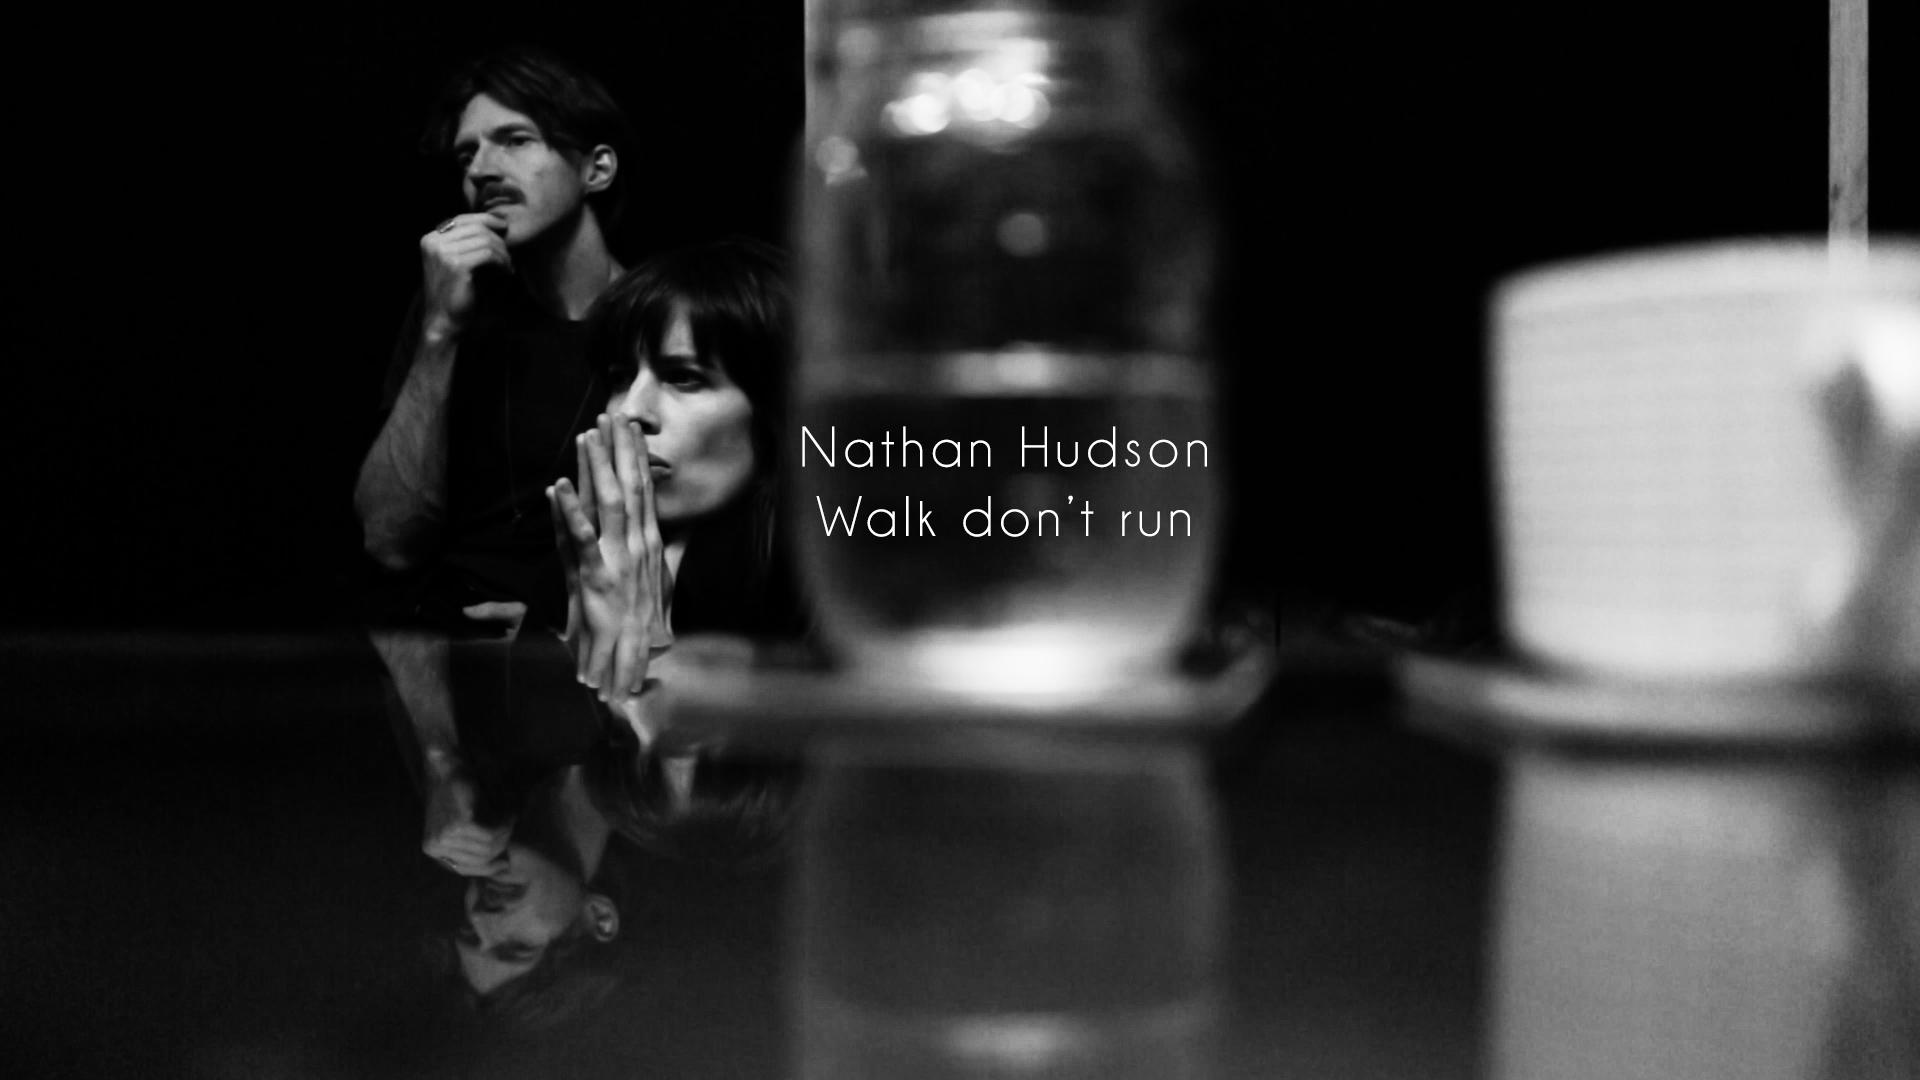 Nathan Hudson